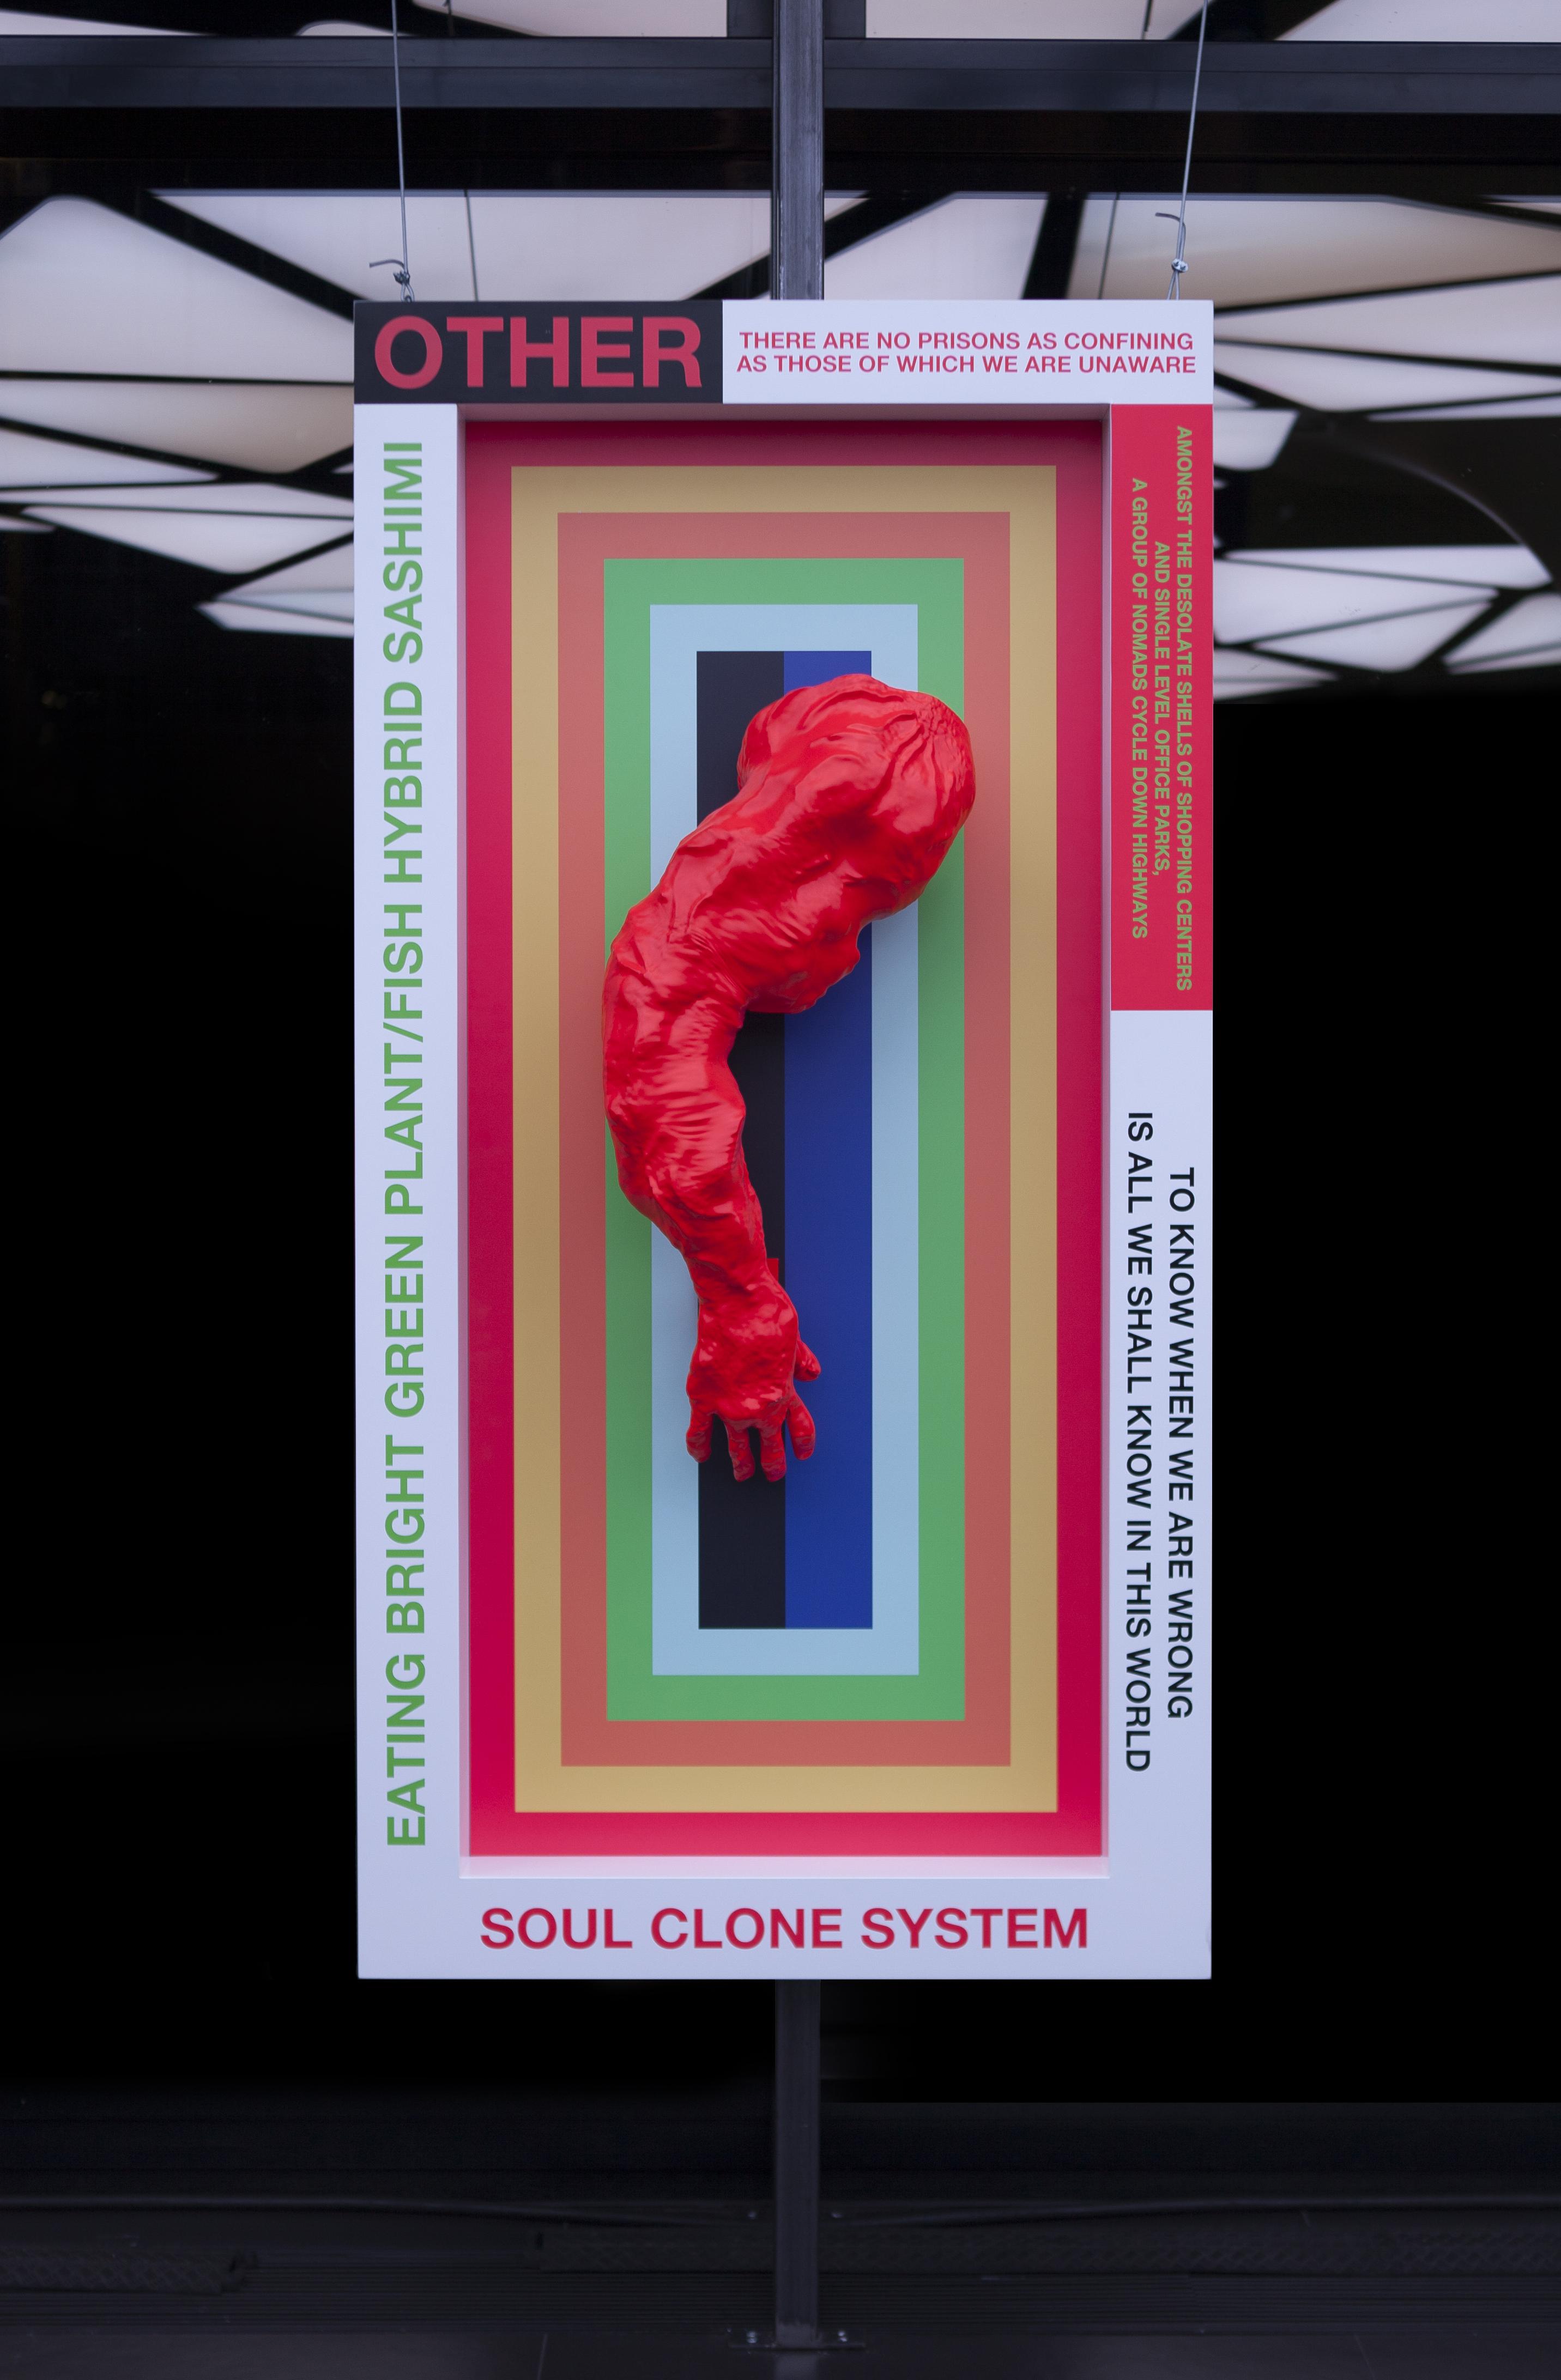 Soul Clone System (2019)